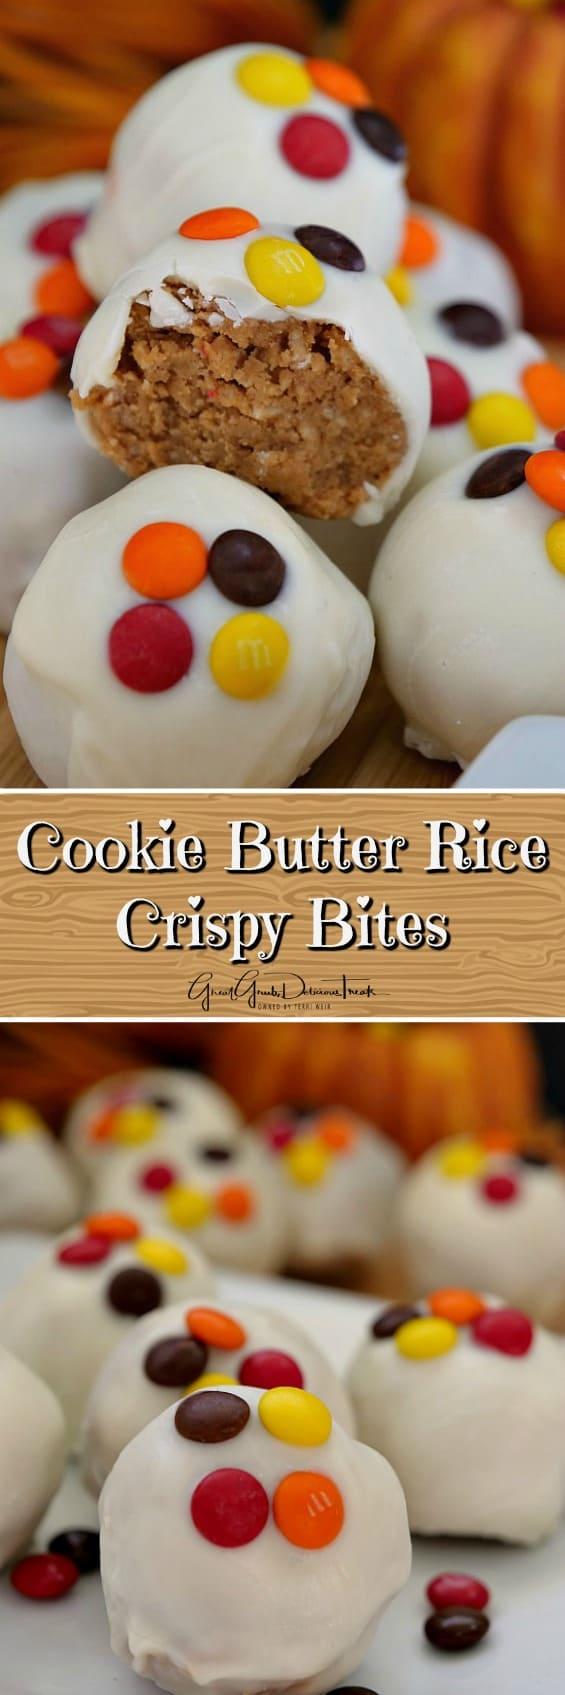 Cookie Butter Rice Crispy Bites